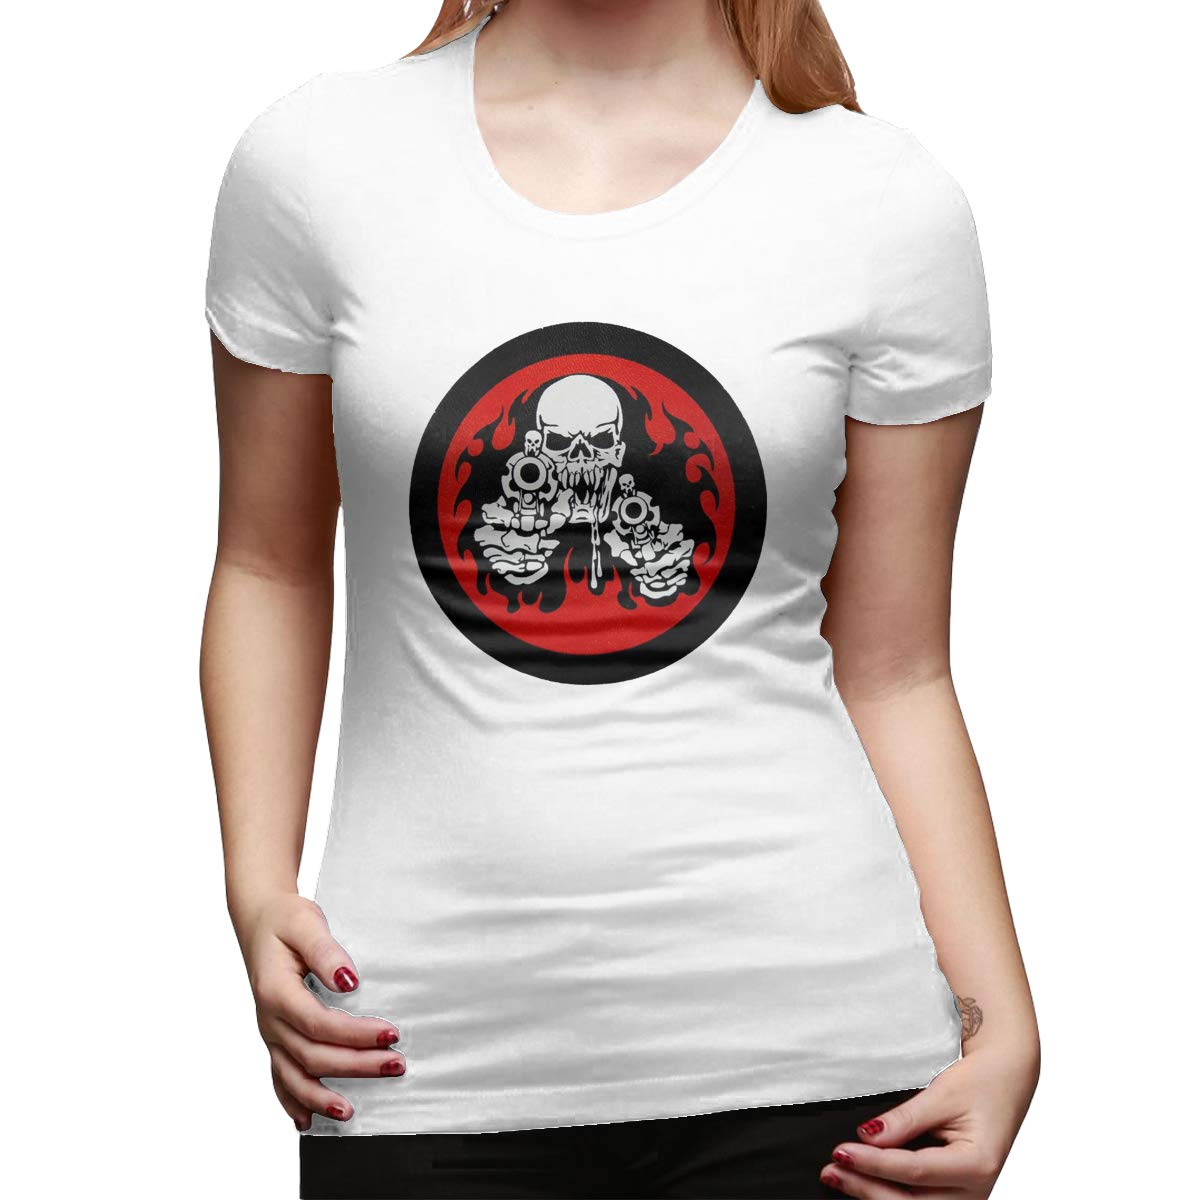 Crewneck Falalaka Skull with Gun00 Womens Cotton Short Sleeve T-Shirt